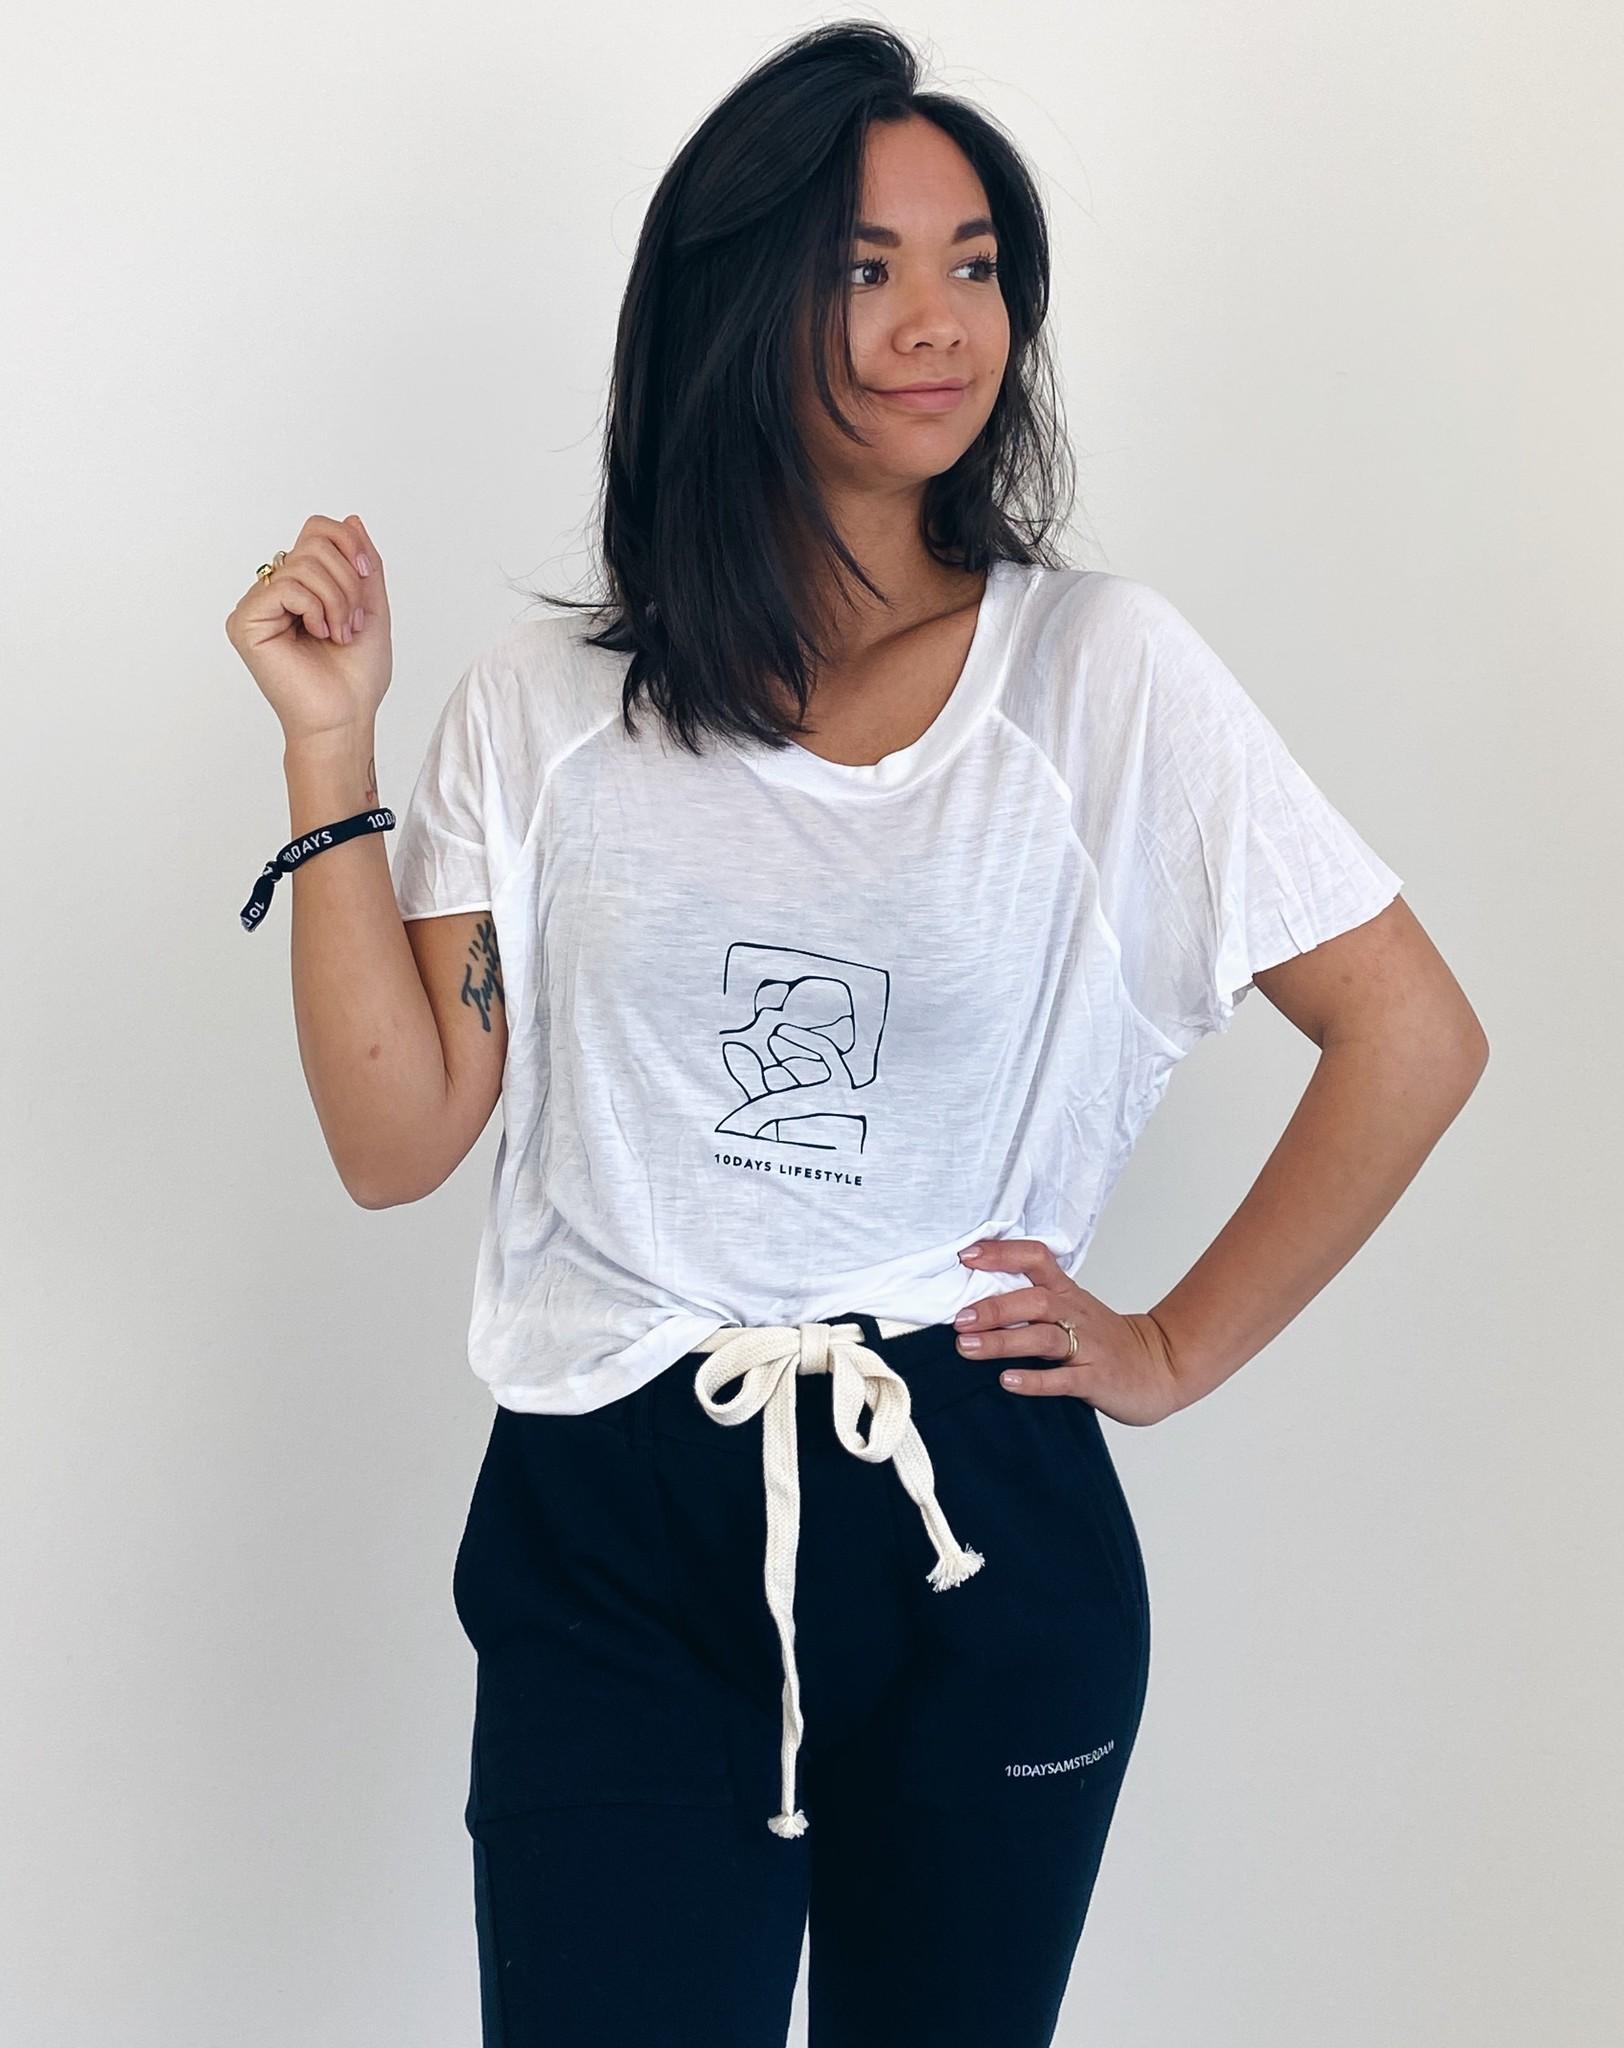 T-shirt shortsleeve tee sketch white-5